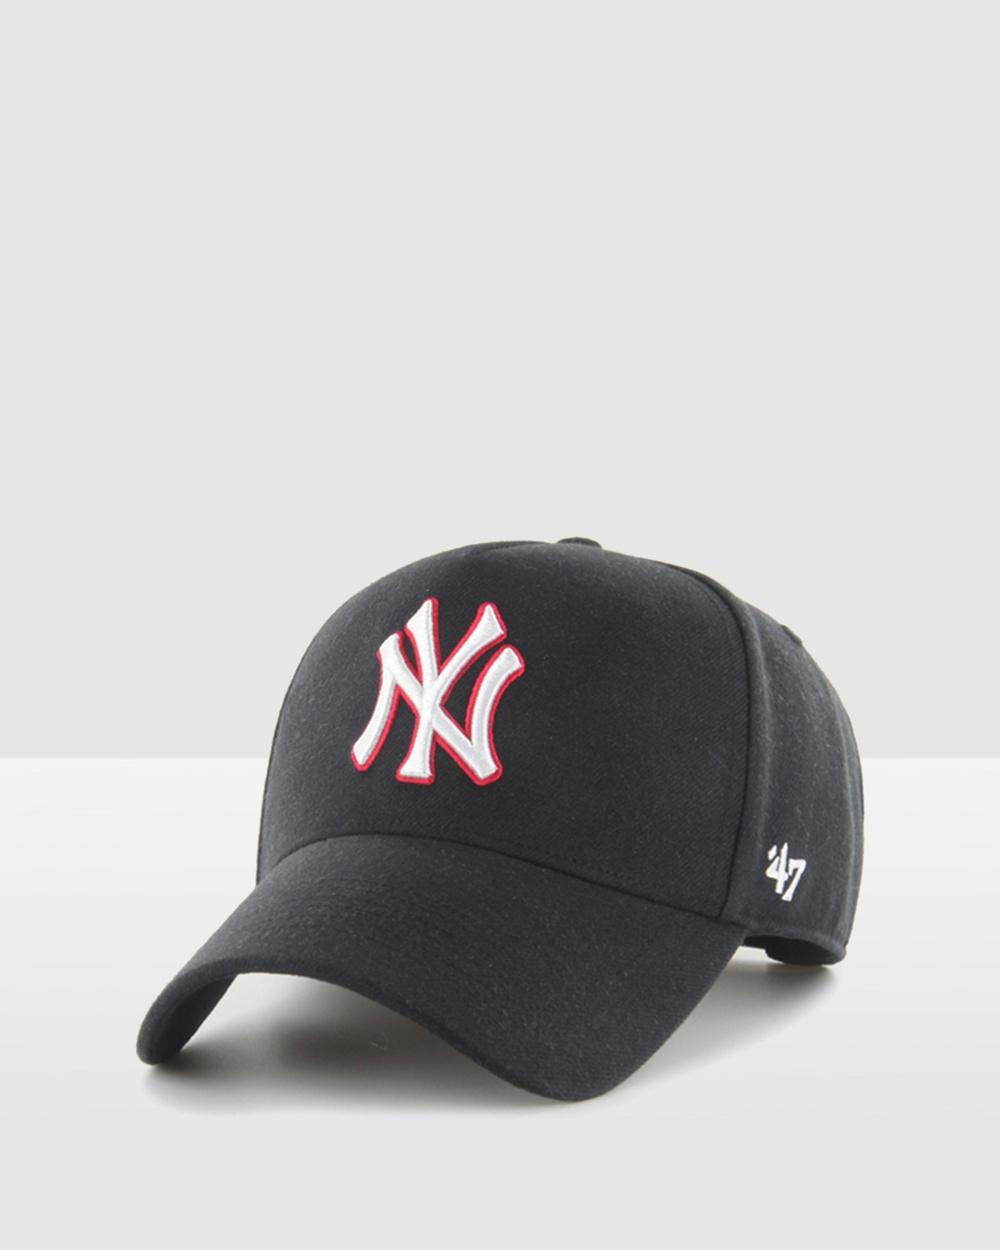 47 New York Yankees Black Replica '47 MVP DT Snapback Headwear black